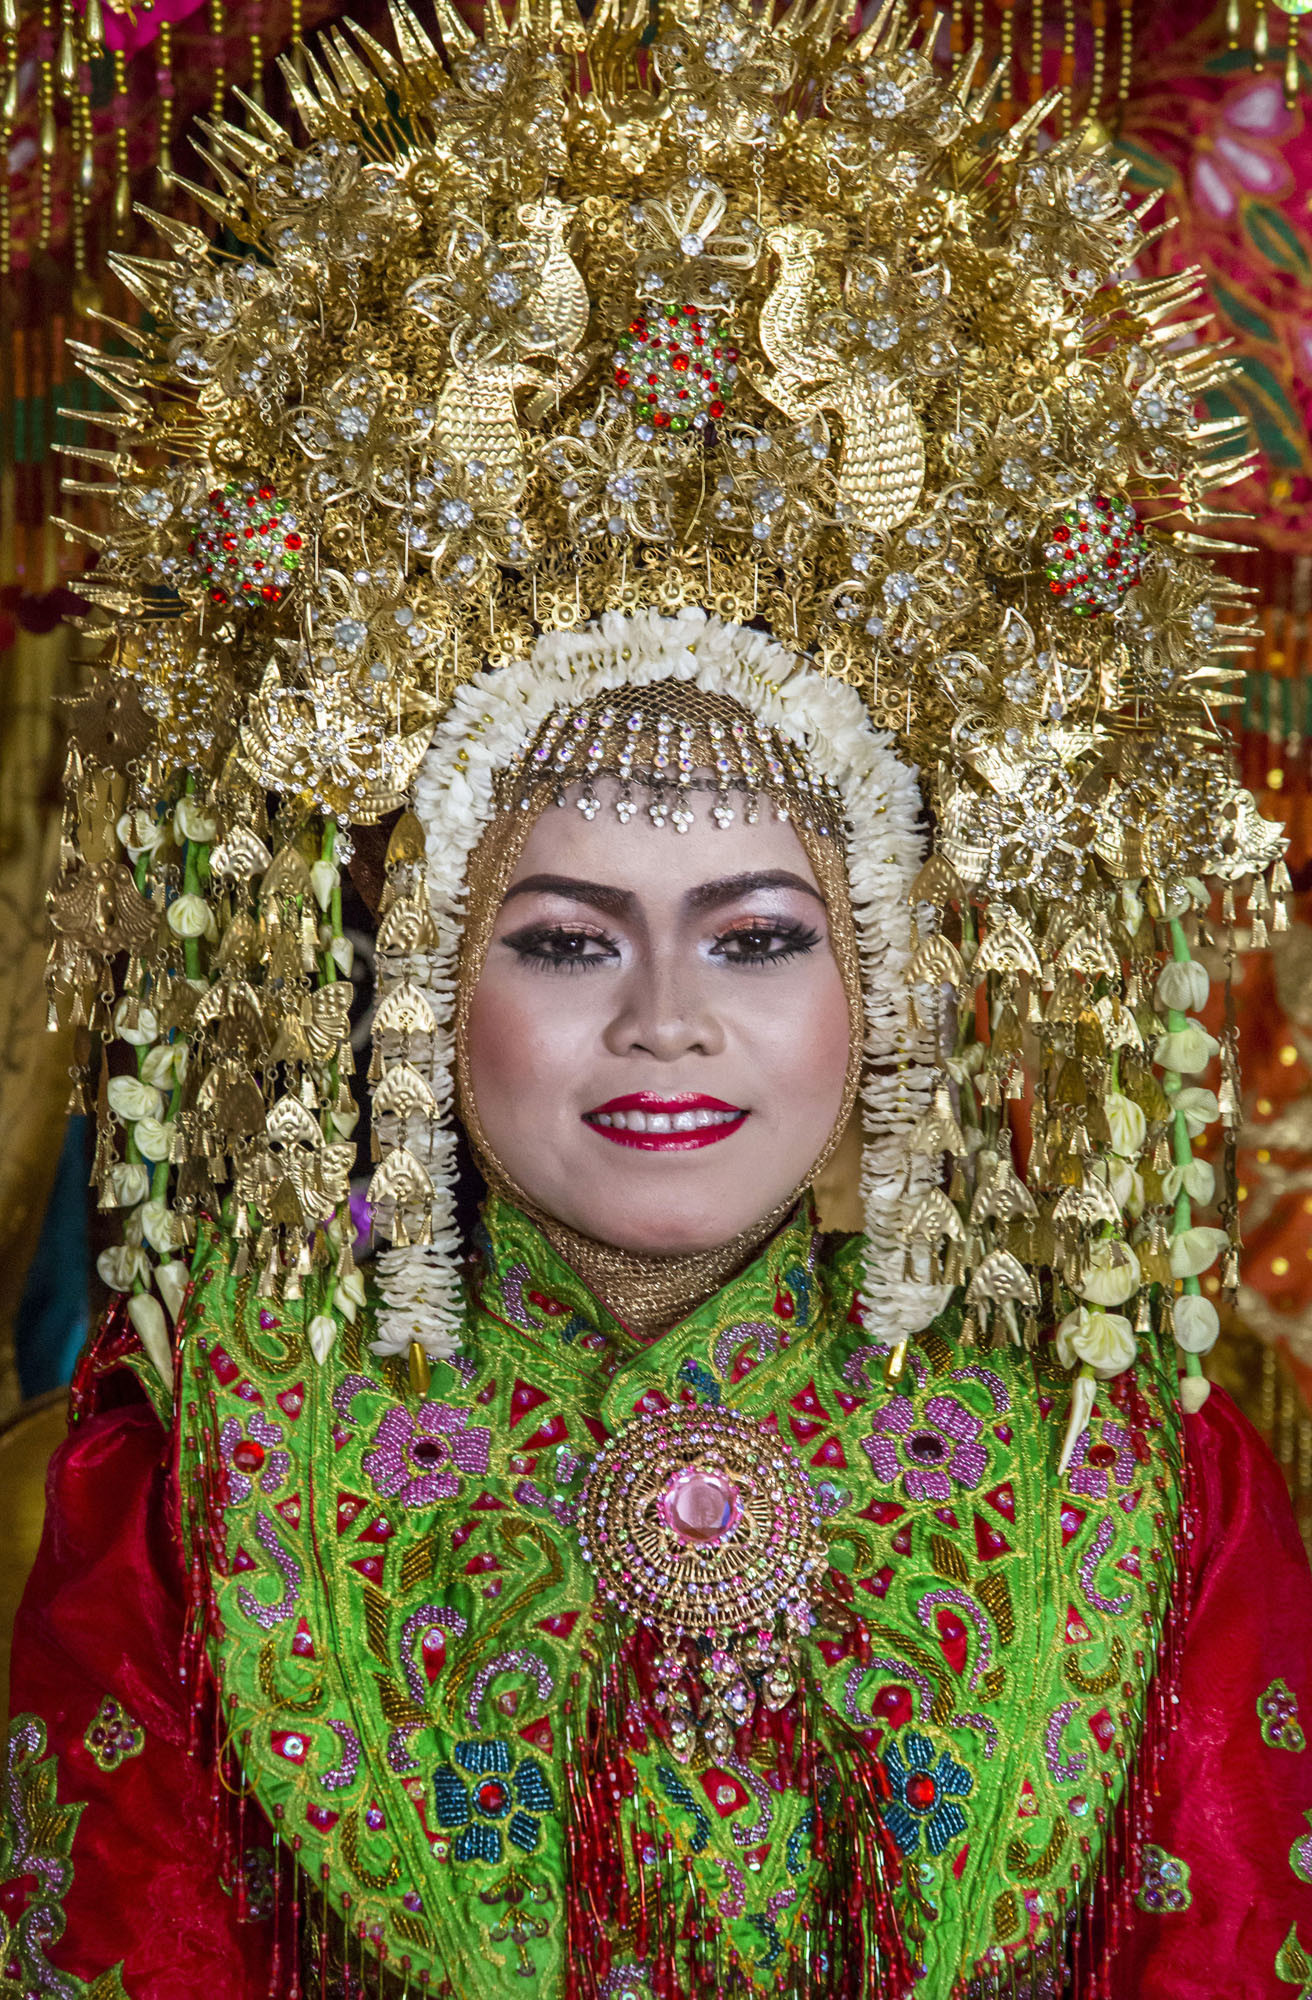 Pengantin perempuan di pesta pernikahan tradisi Minangkabau, Sumatra Barat.